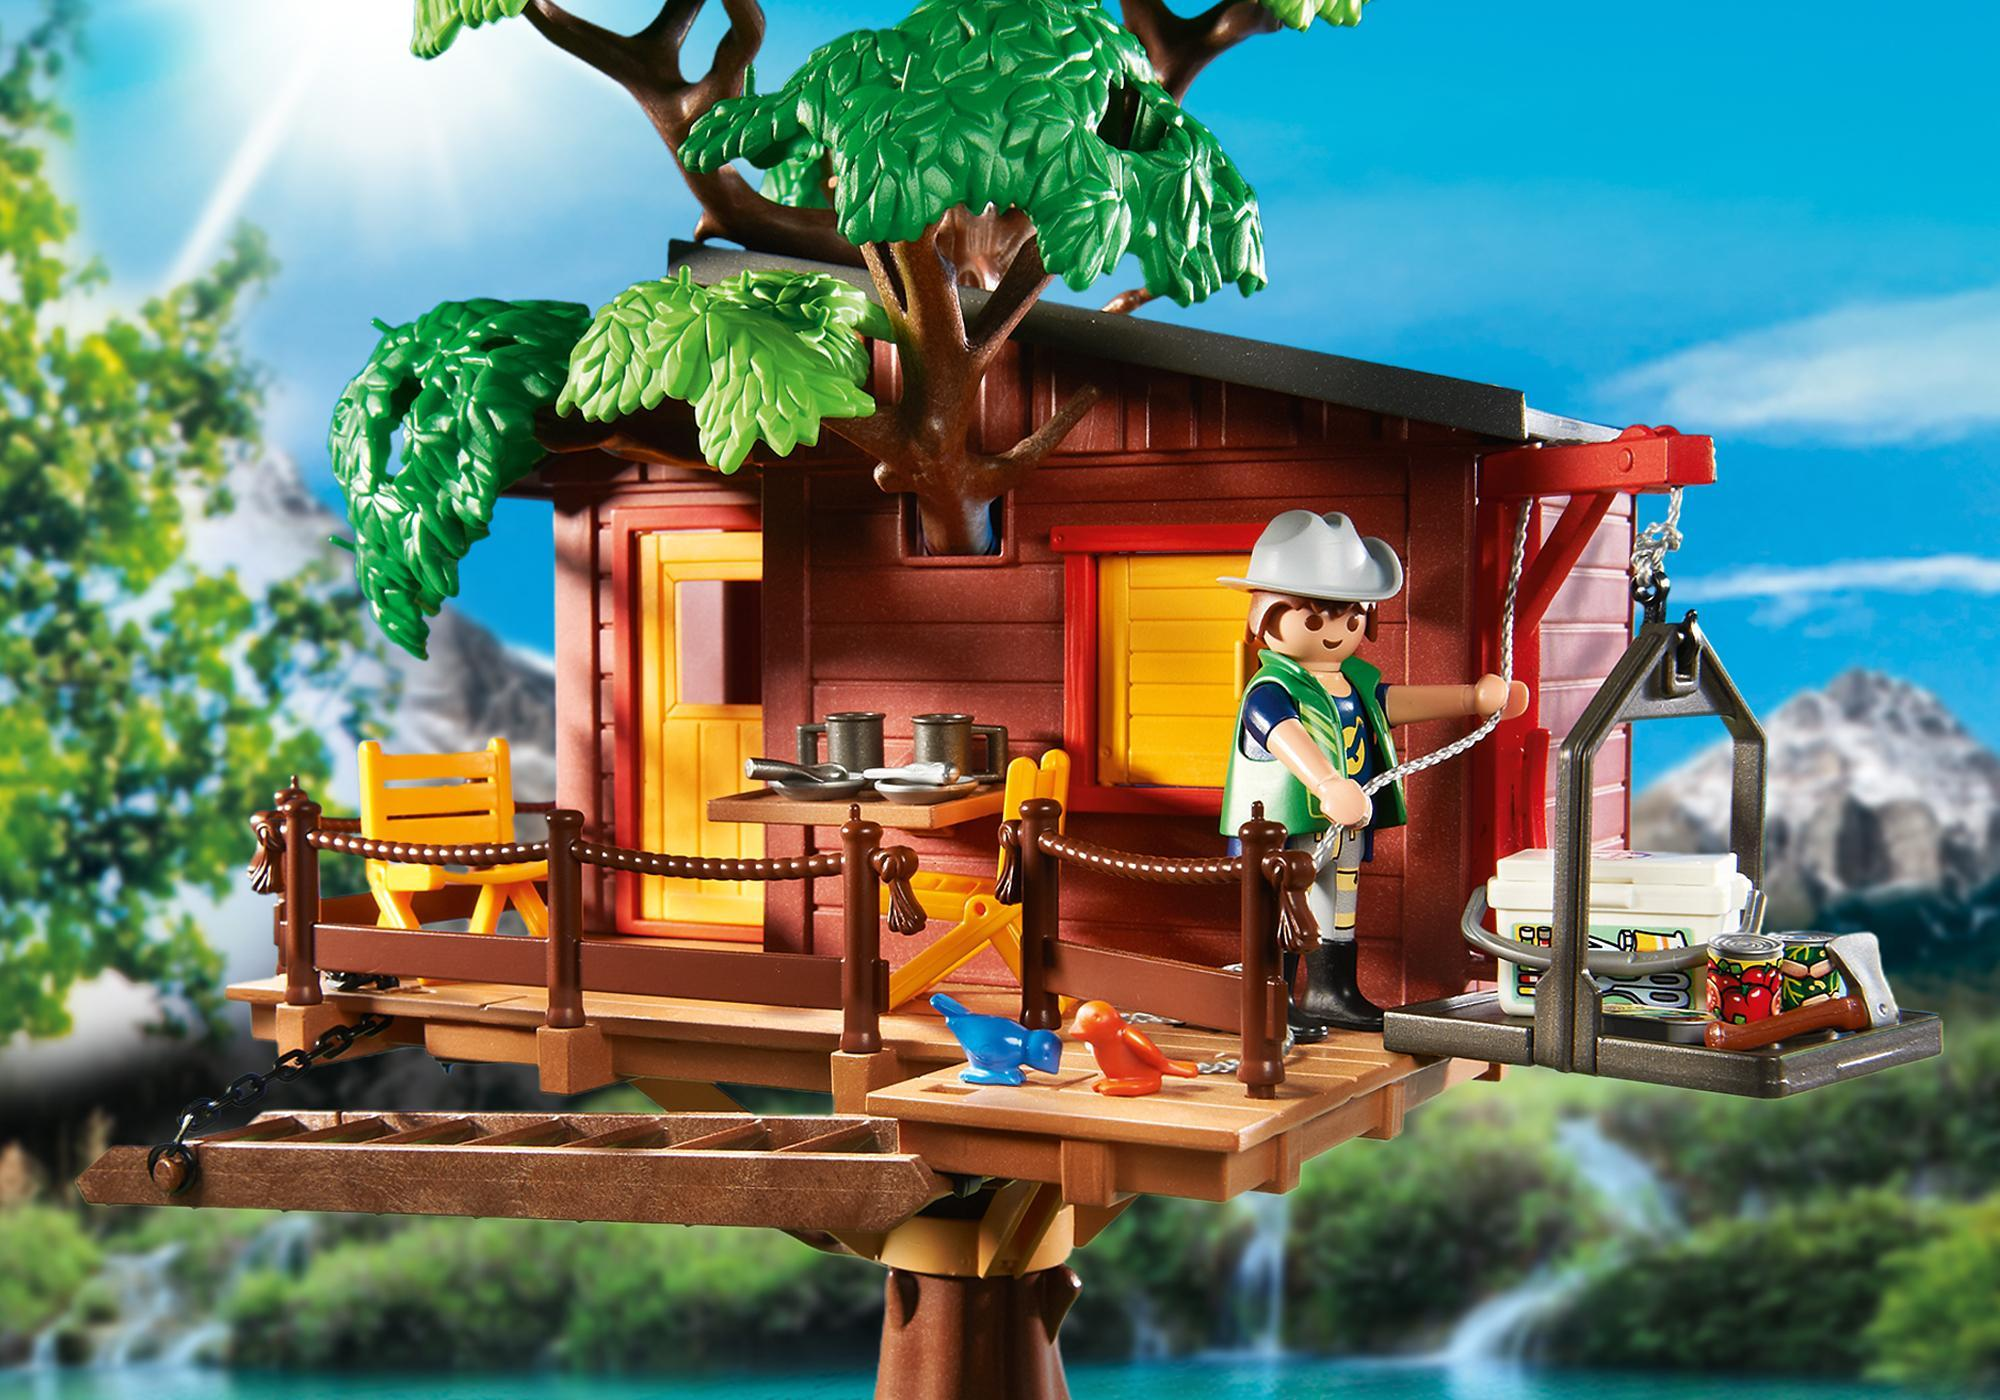 http://media.playmobil.com/i/playmobil/5557_product_extra3/Avontuurlijke boomhut